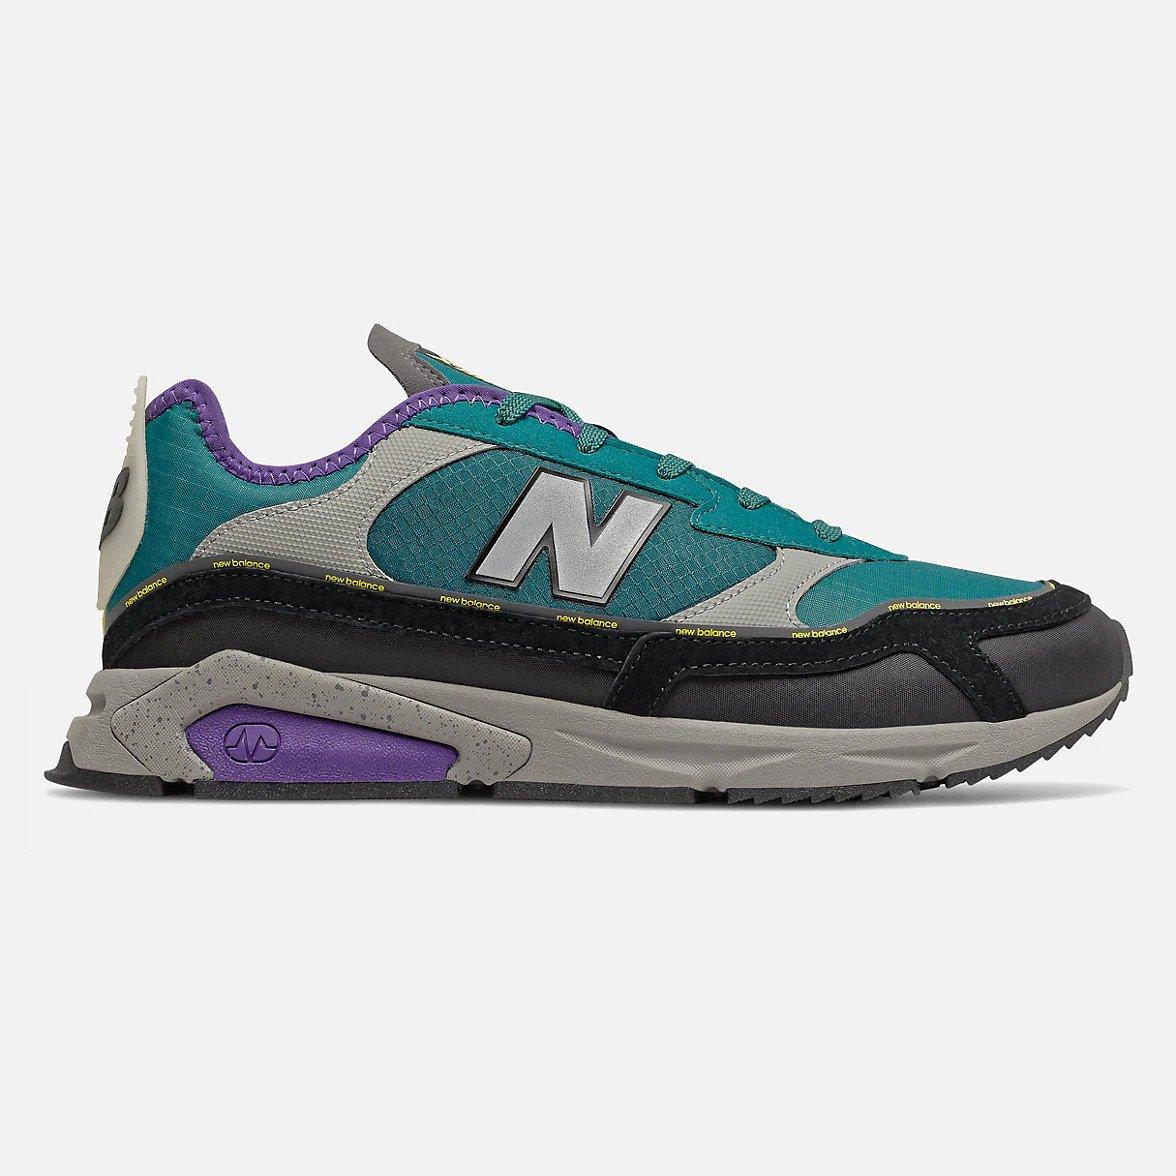 new balance, x racer, korting, sneakers, end of season, sale